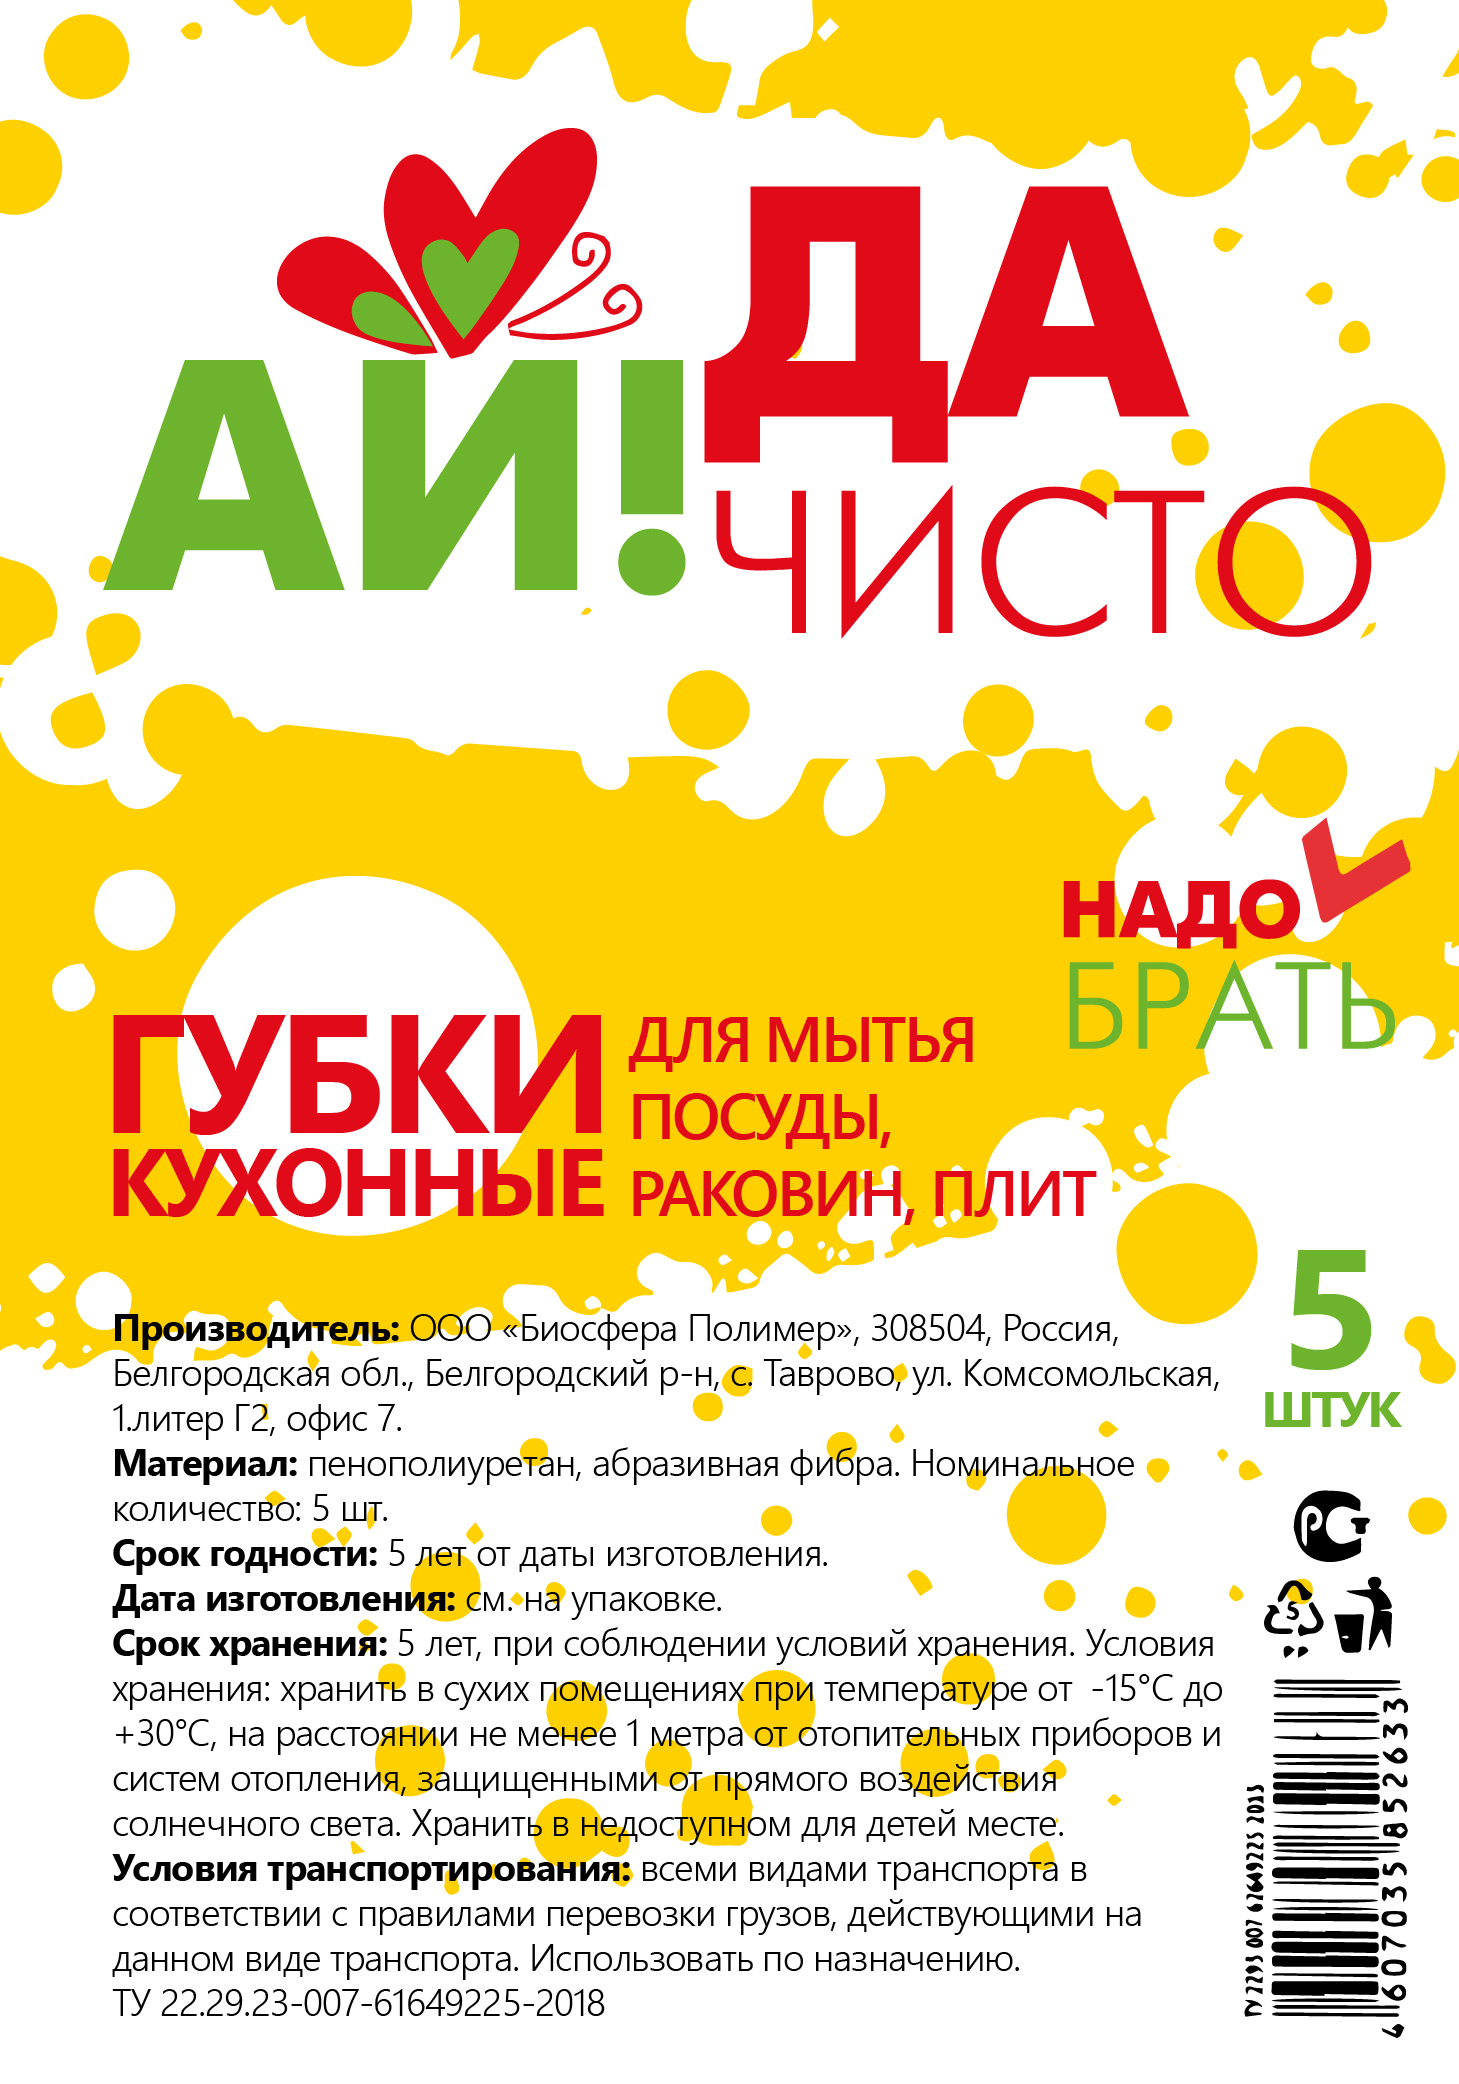 Дизайн логотипа и упаковки СТМ фото f_8535c5dc3447e12e.jpg